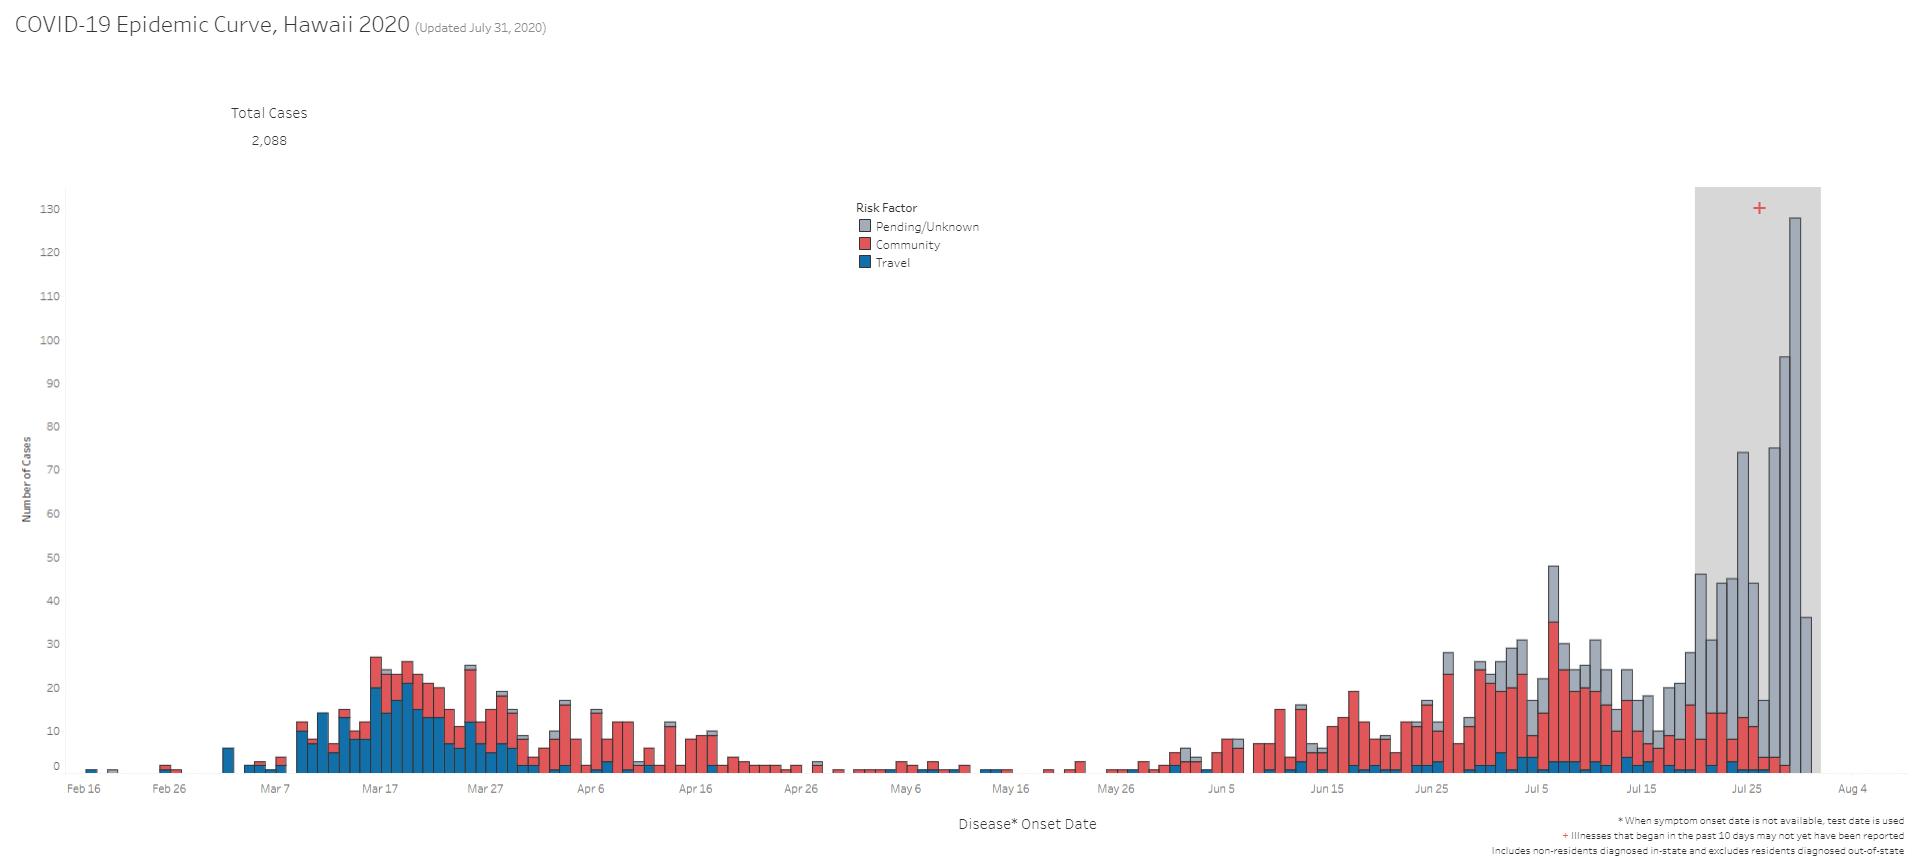 COVID-19 Epidemic Curve Hawaii July 31, 2020